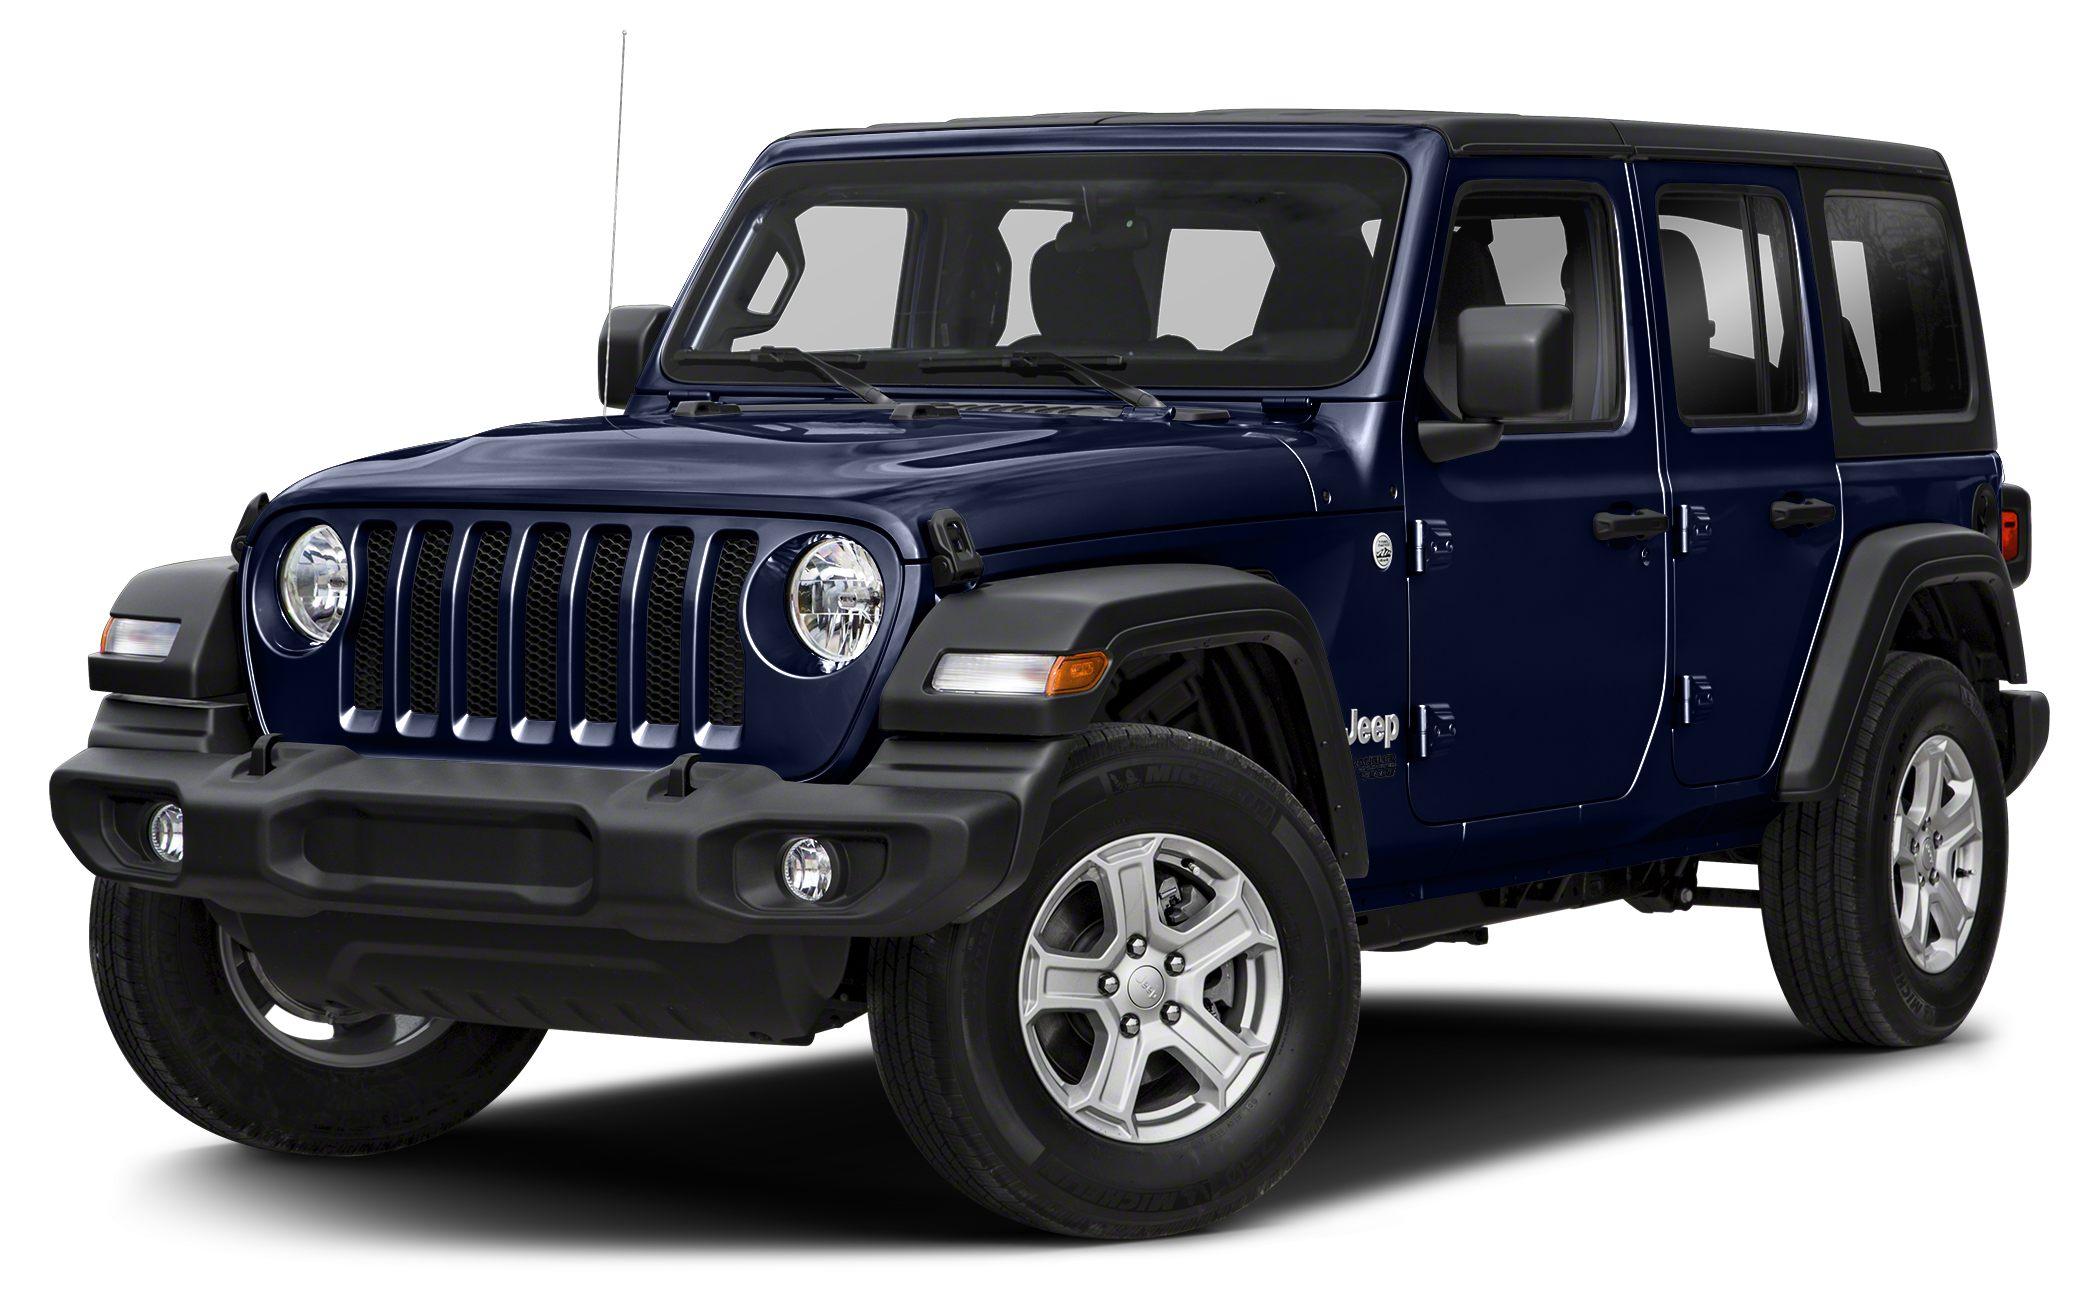 2018 Jeep Wrangler Unlimited Sport Recent Arrival 2018 Jeep Wrangler Unlimited Sport Ocean Blue M